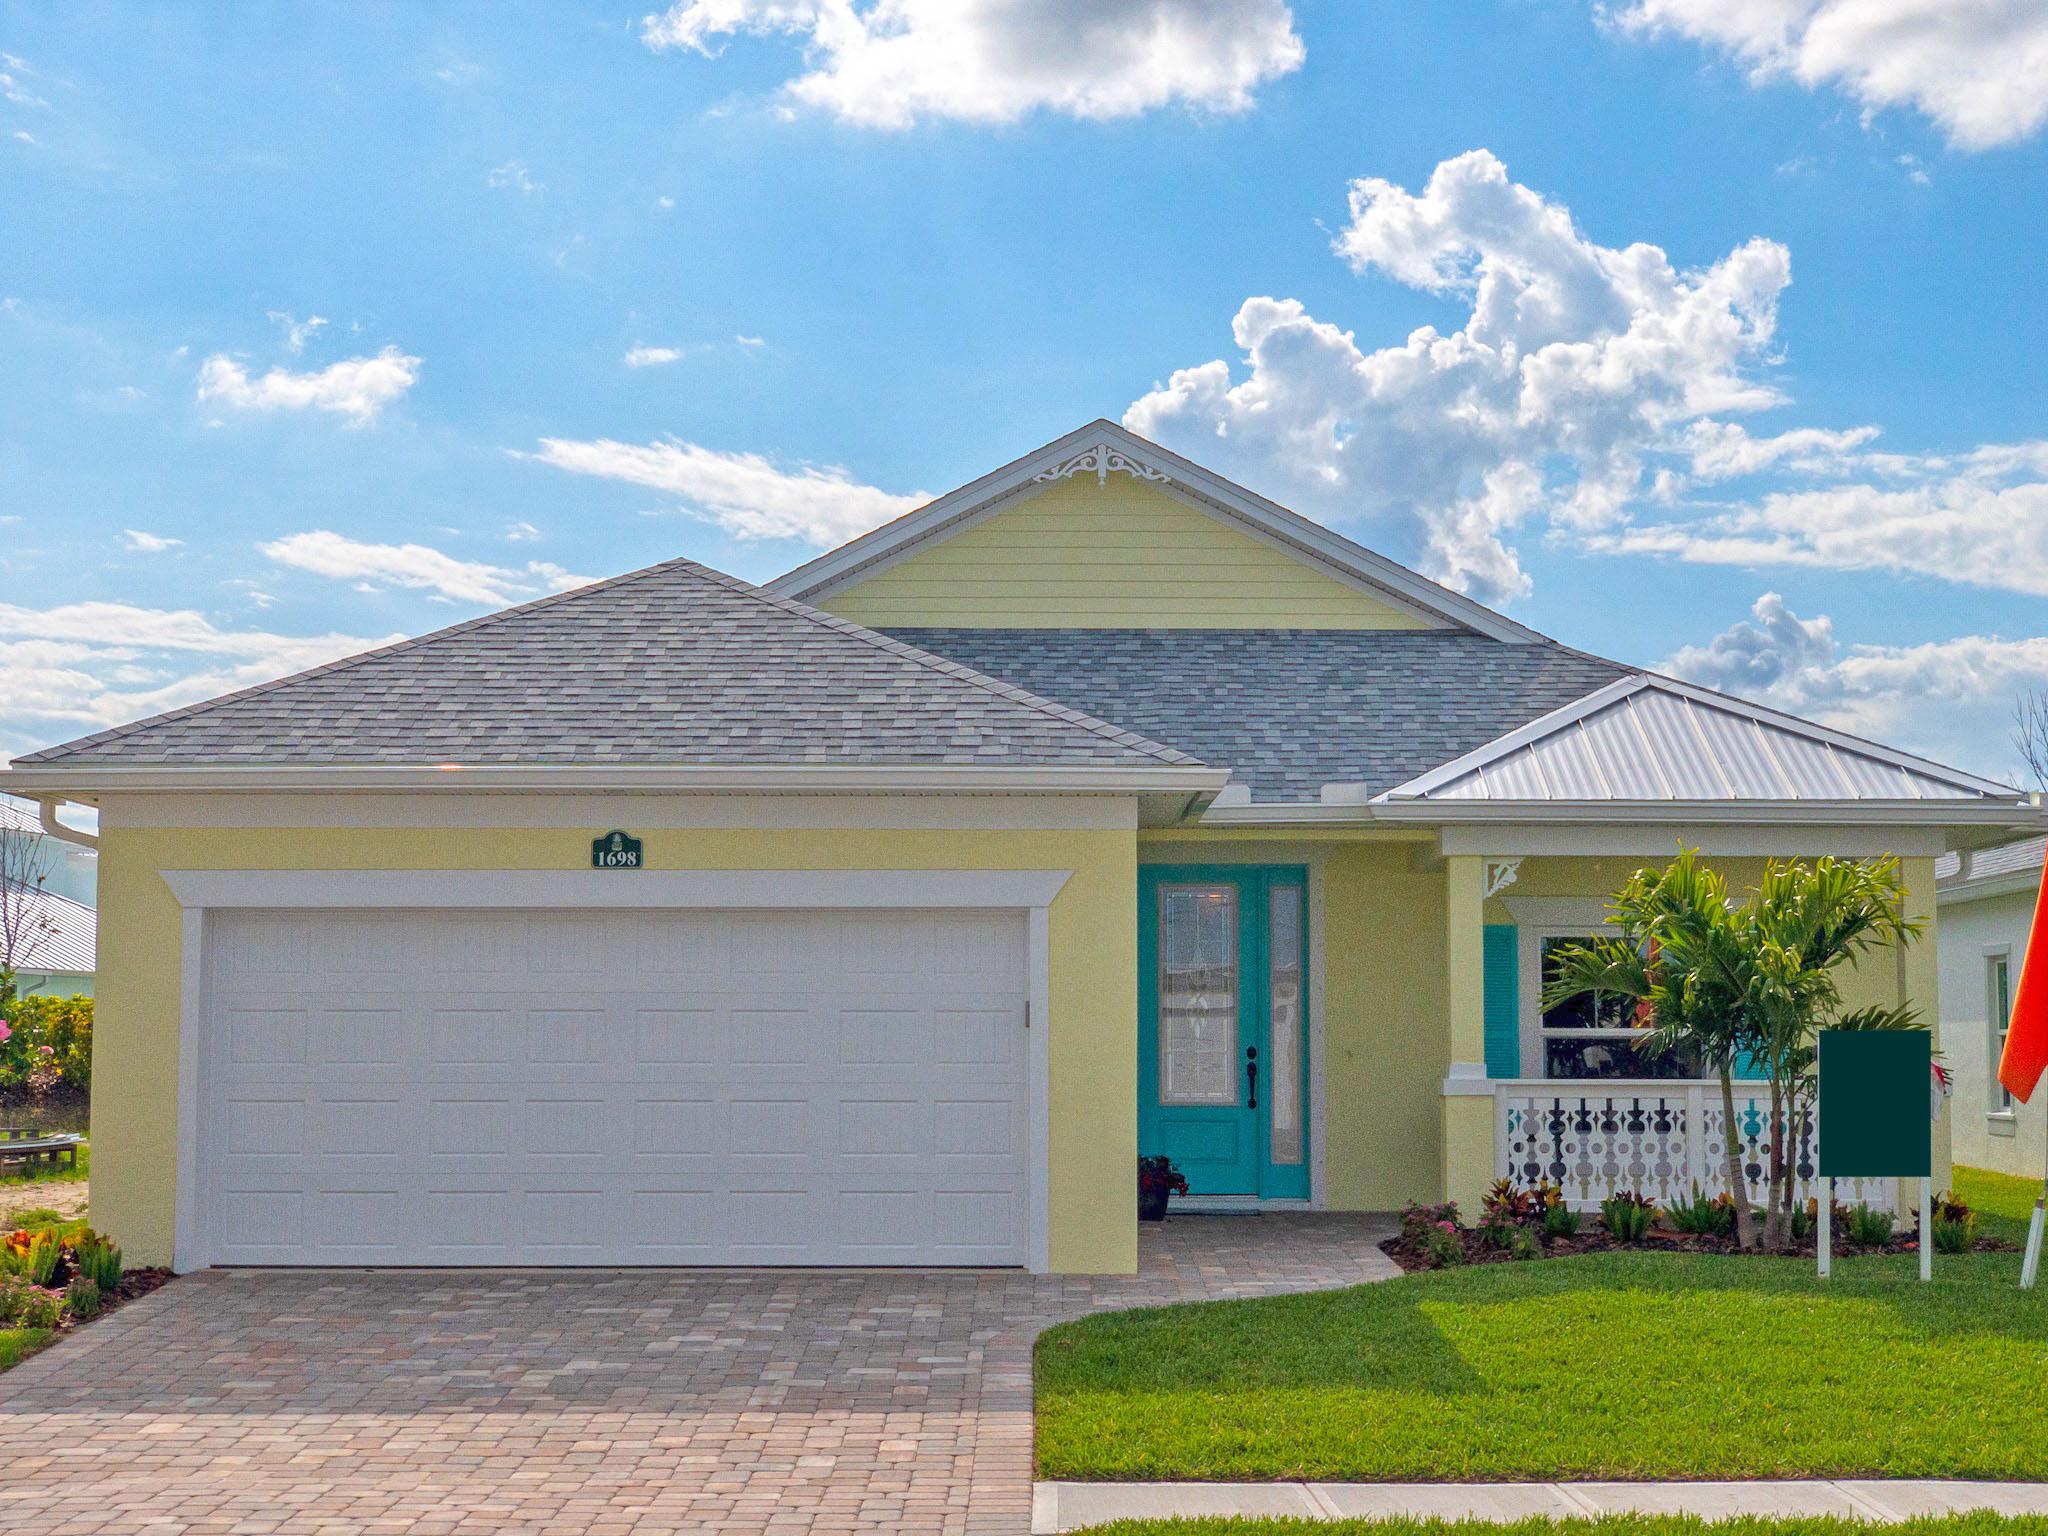 1698 Tullagee AveMelbourne, FL 32940$405,500 - 4 bed◽2 bath◽2 car garage2,050 sq ft under air ◽ 2,806 sq ft total